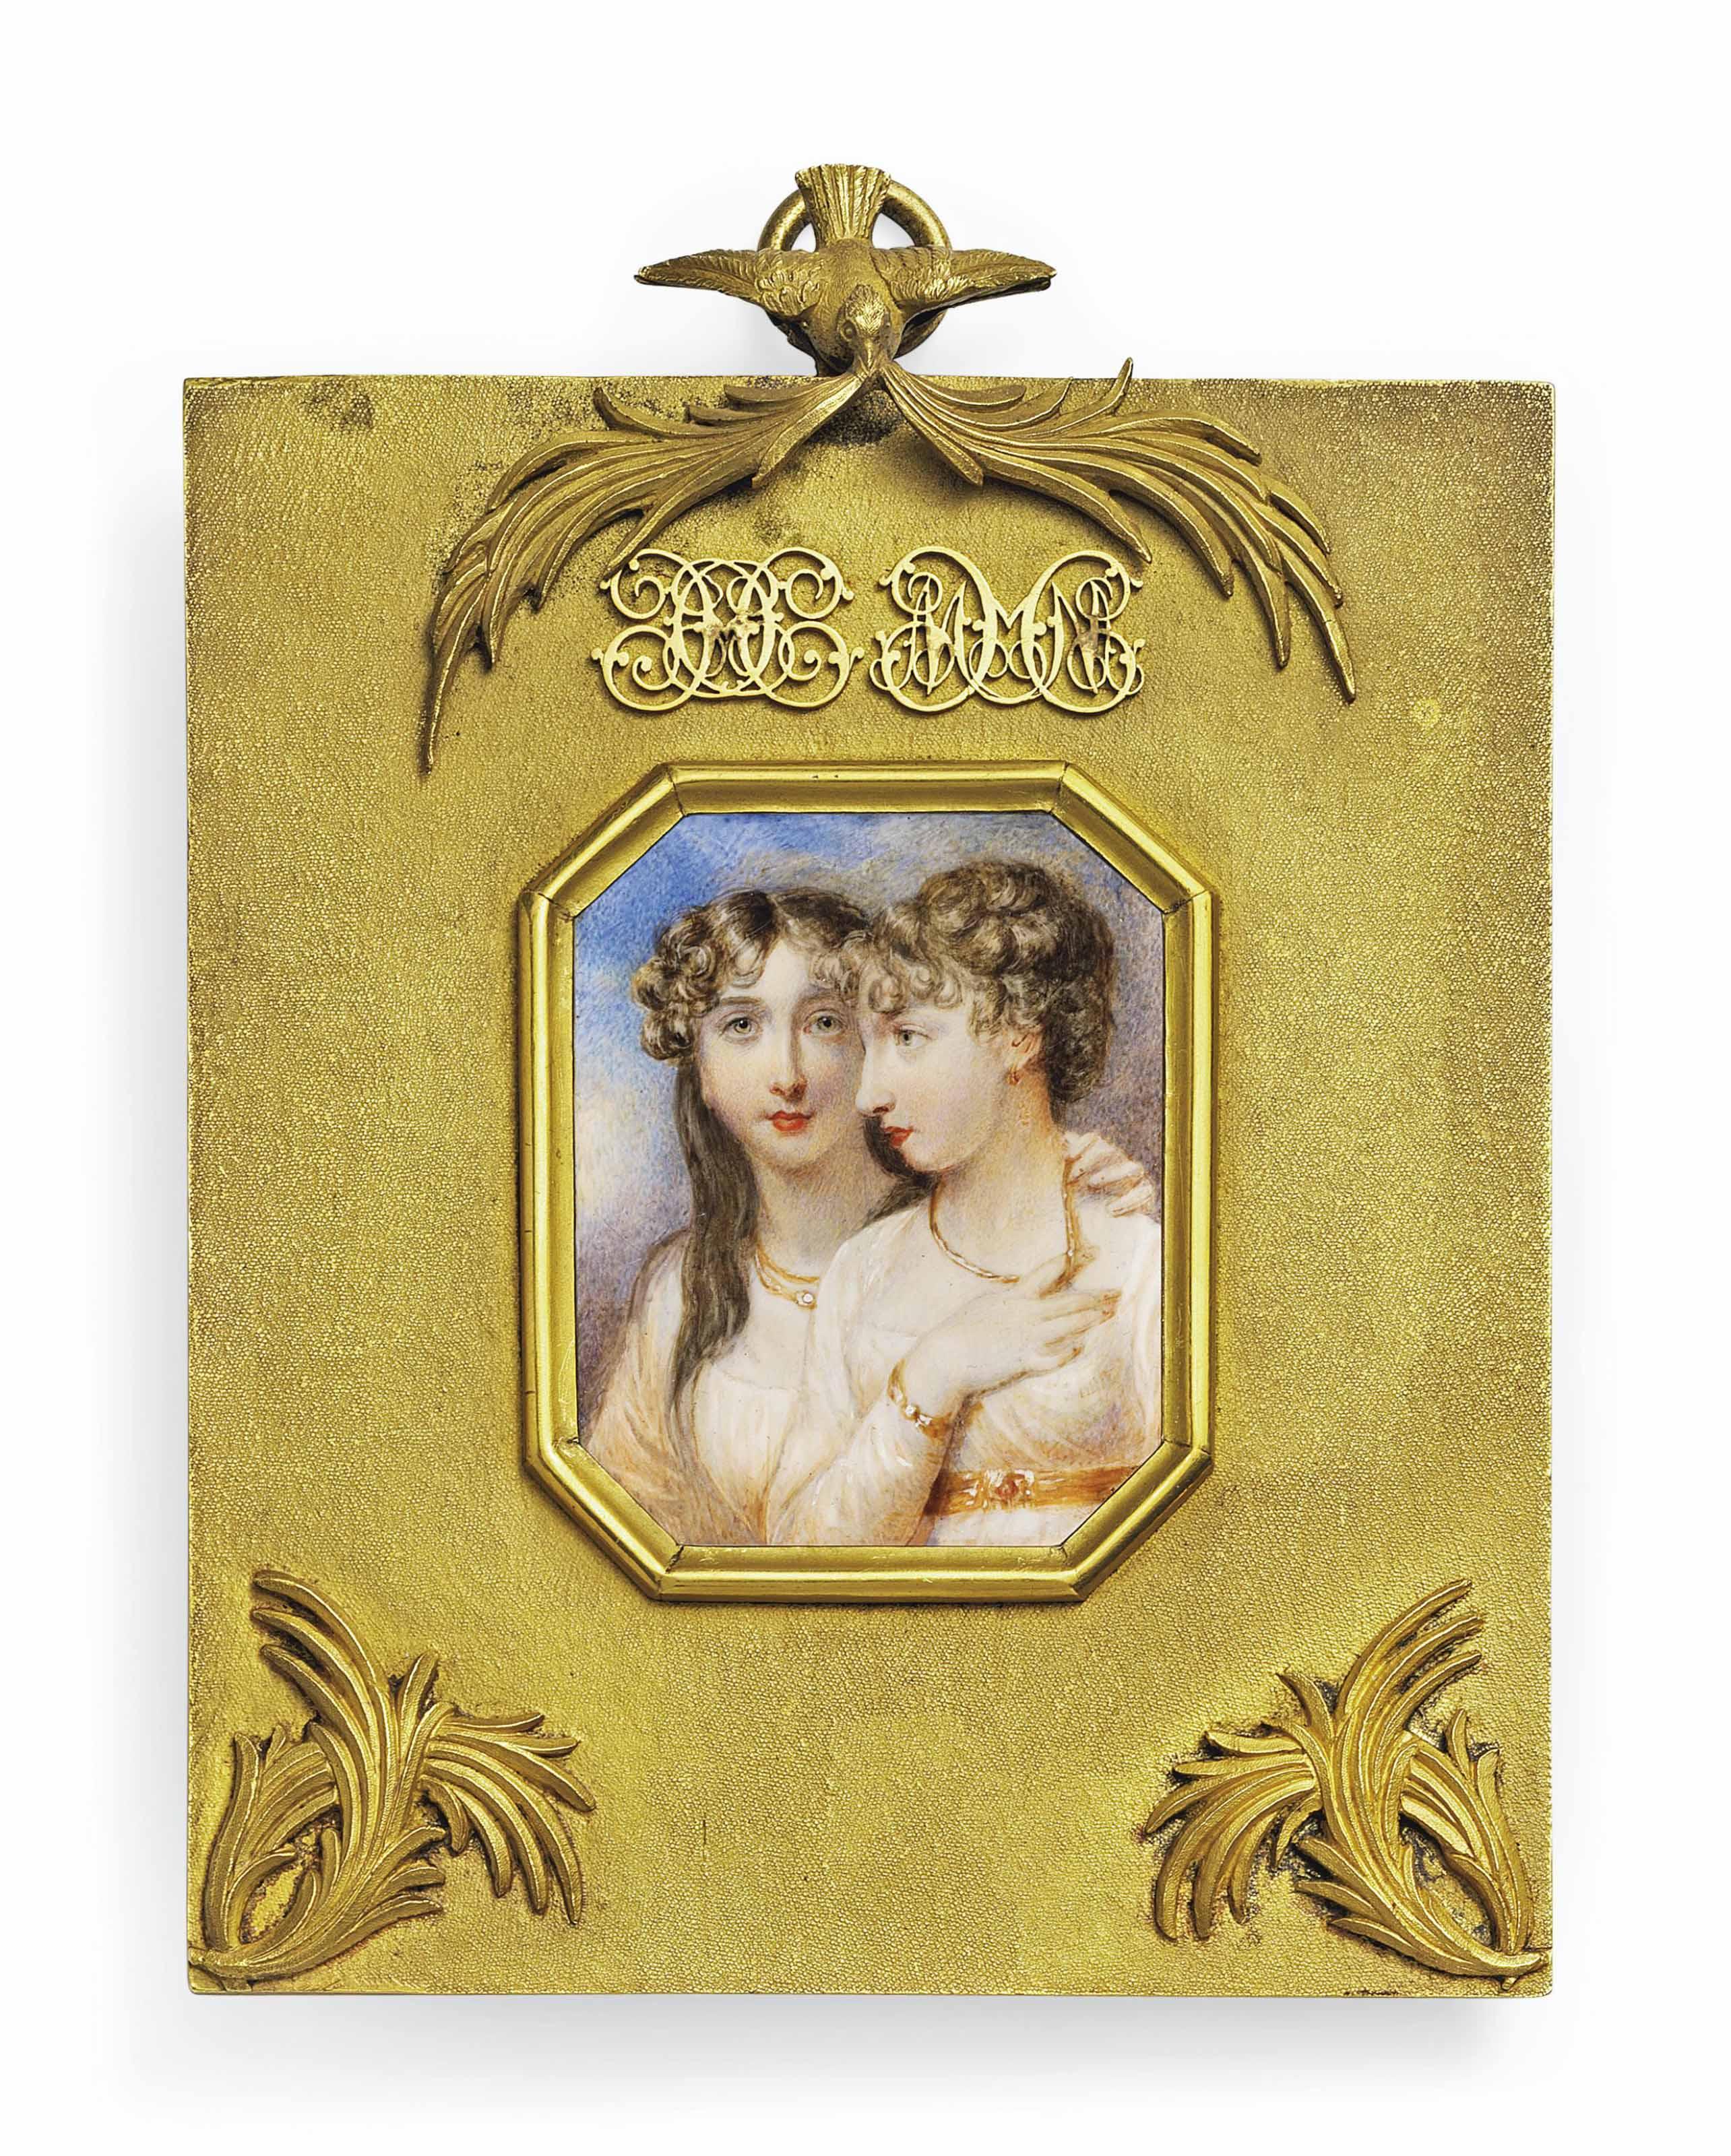 ANNE MEE, NEE FOLDSONE (BRITISH, C. 1770/75-1851)